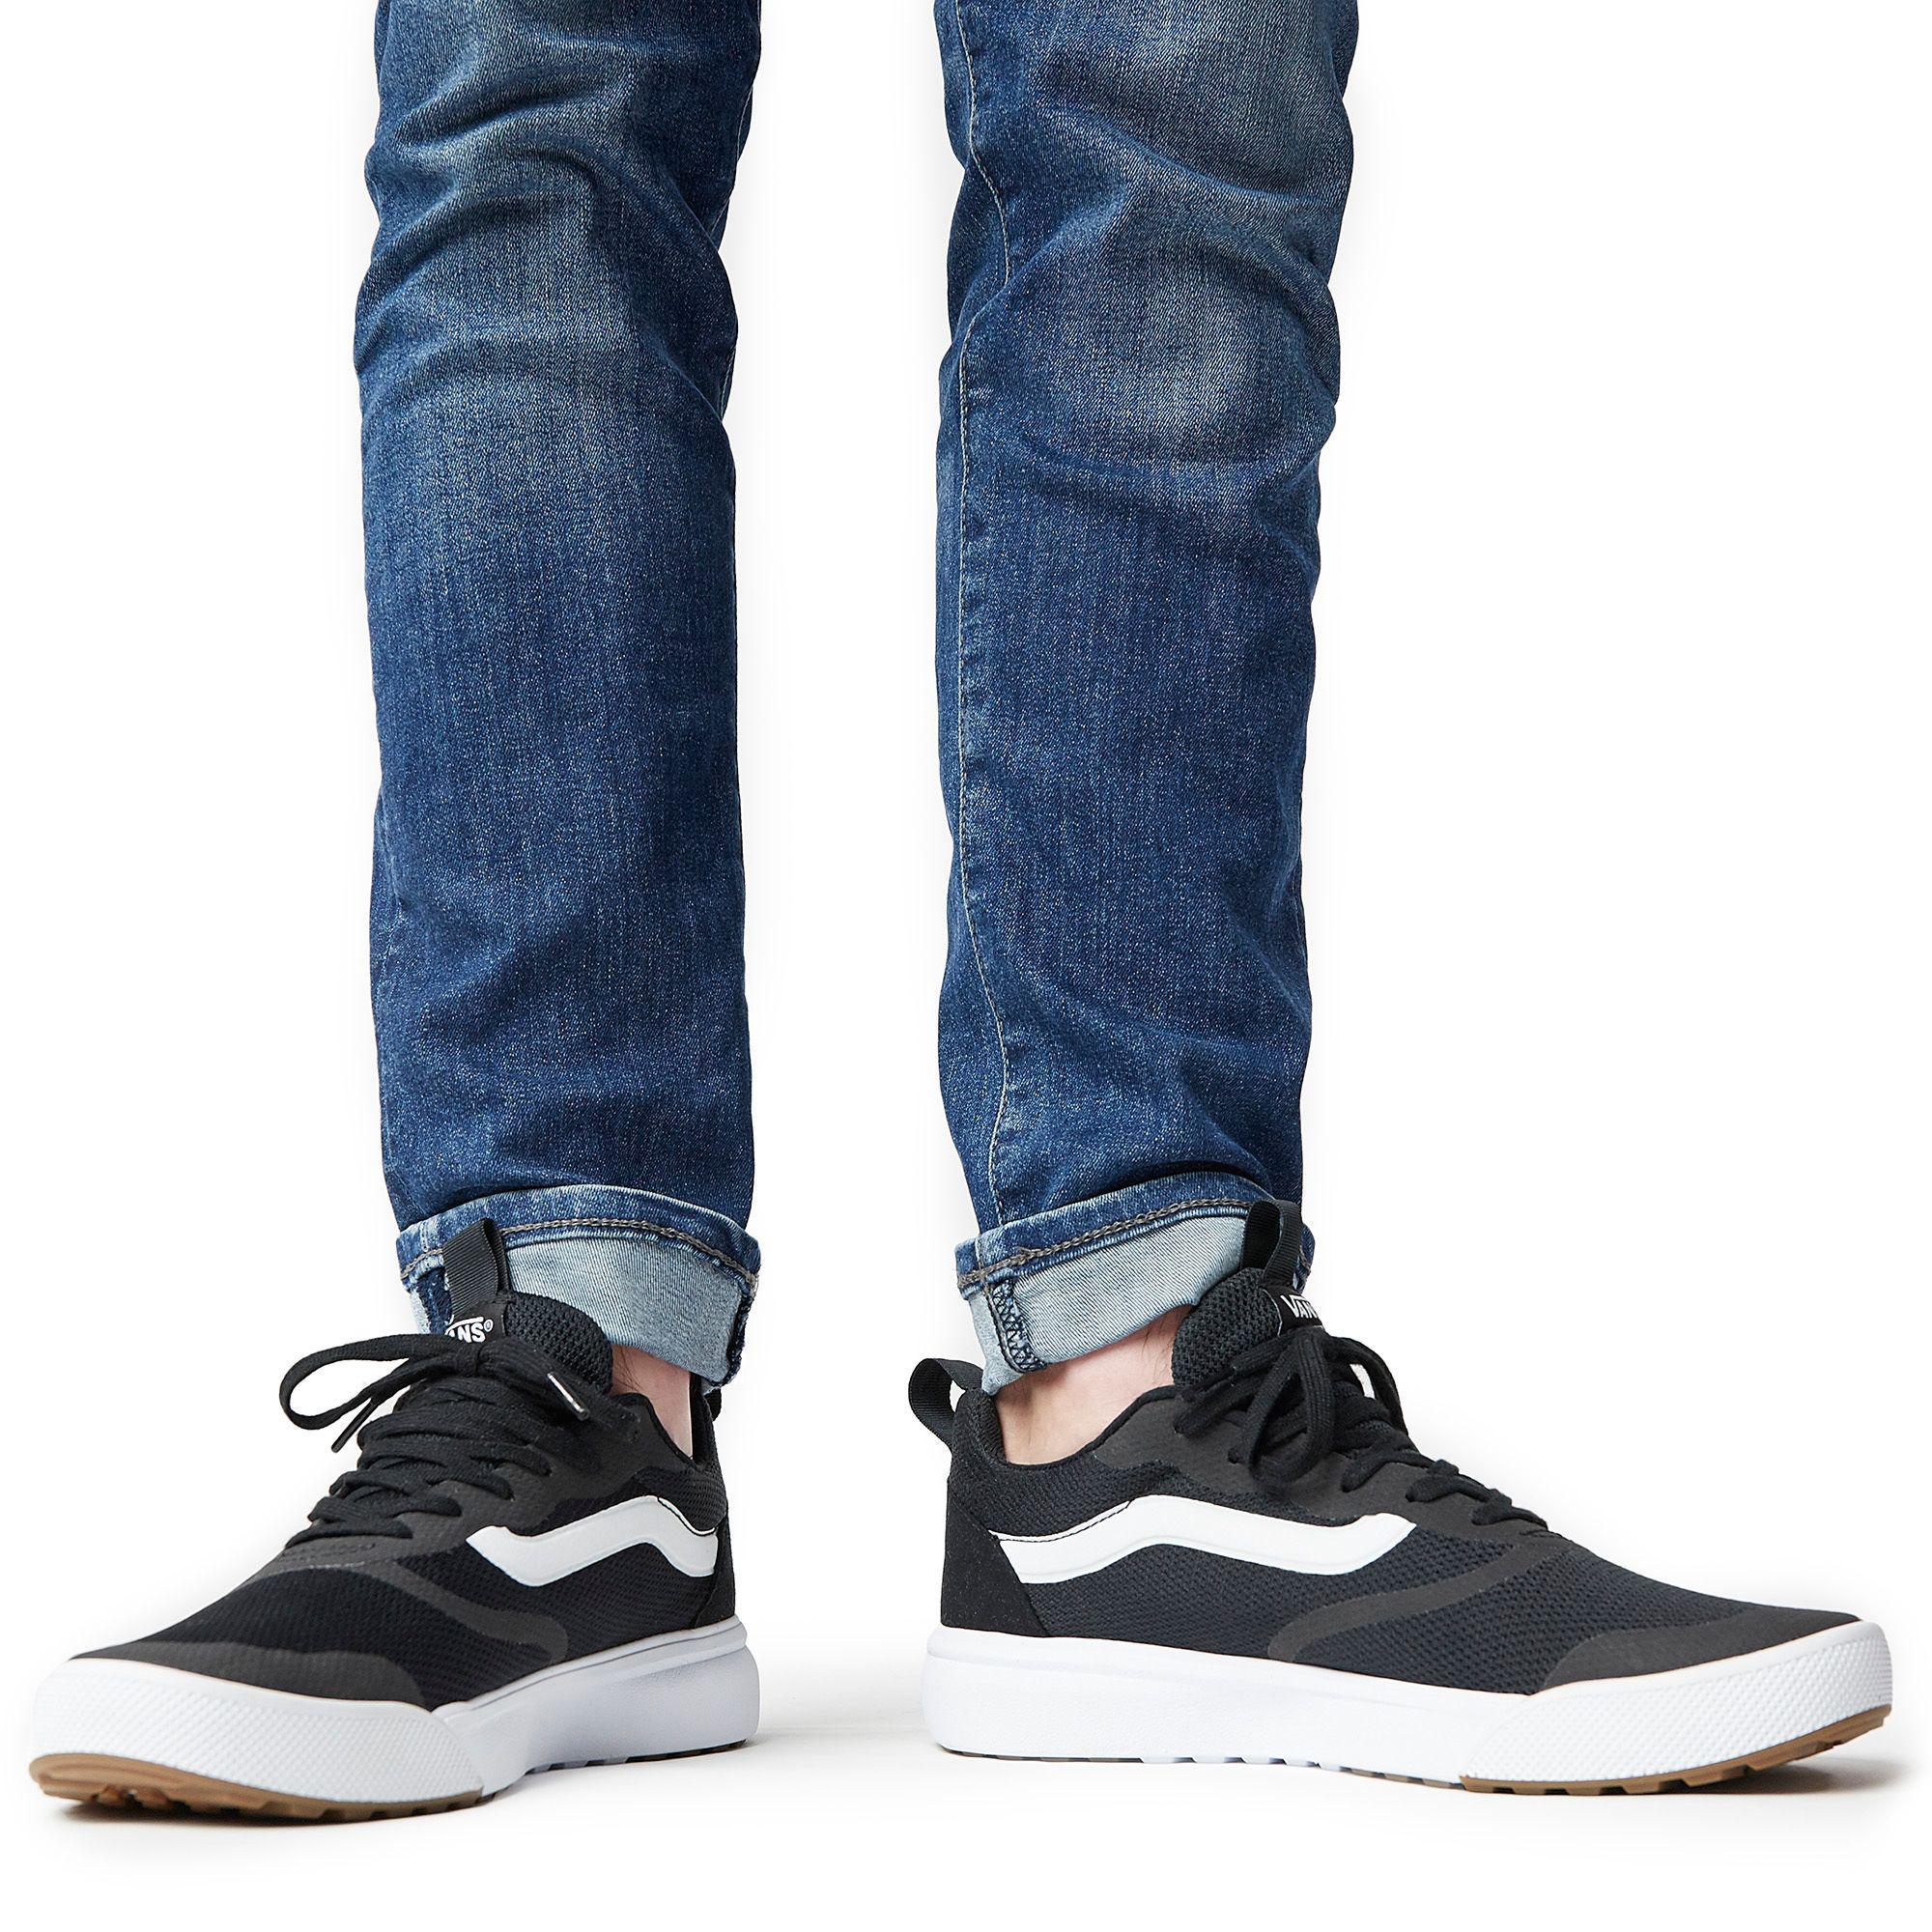 Ultrarange Rapidweld Vans For Shoes Men Black Flc1TKJ